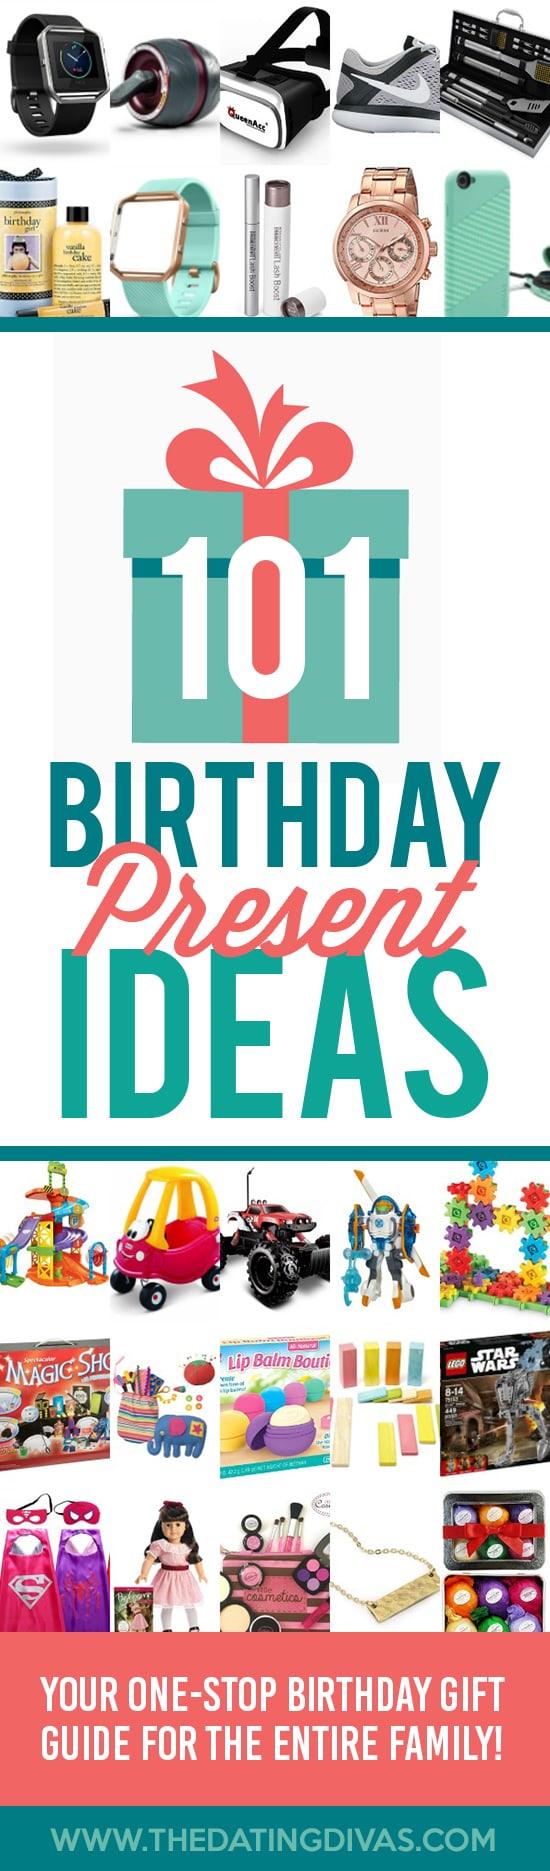 101 Birthday Presents